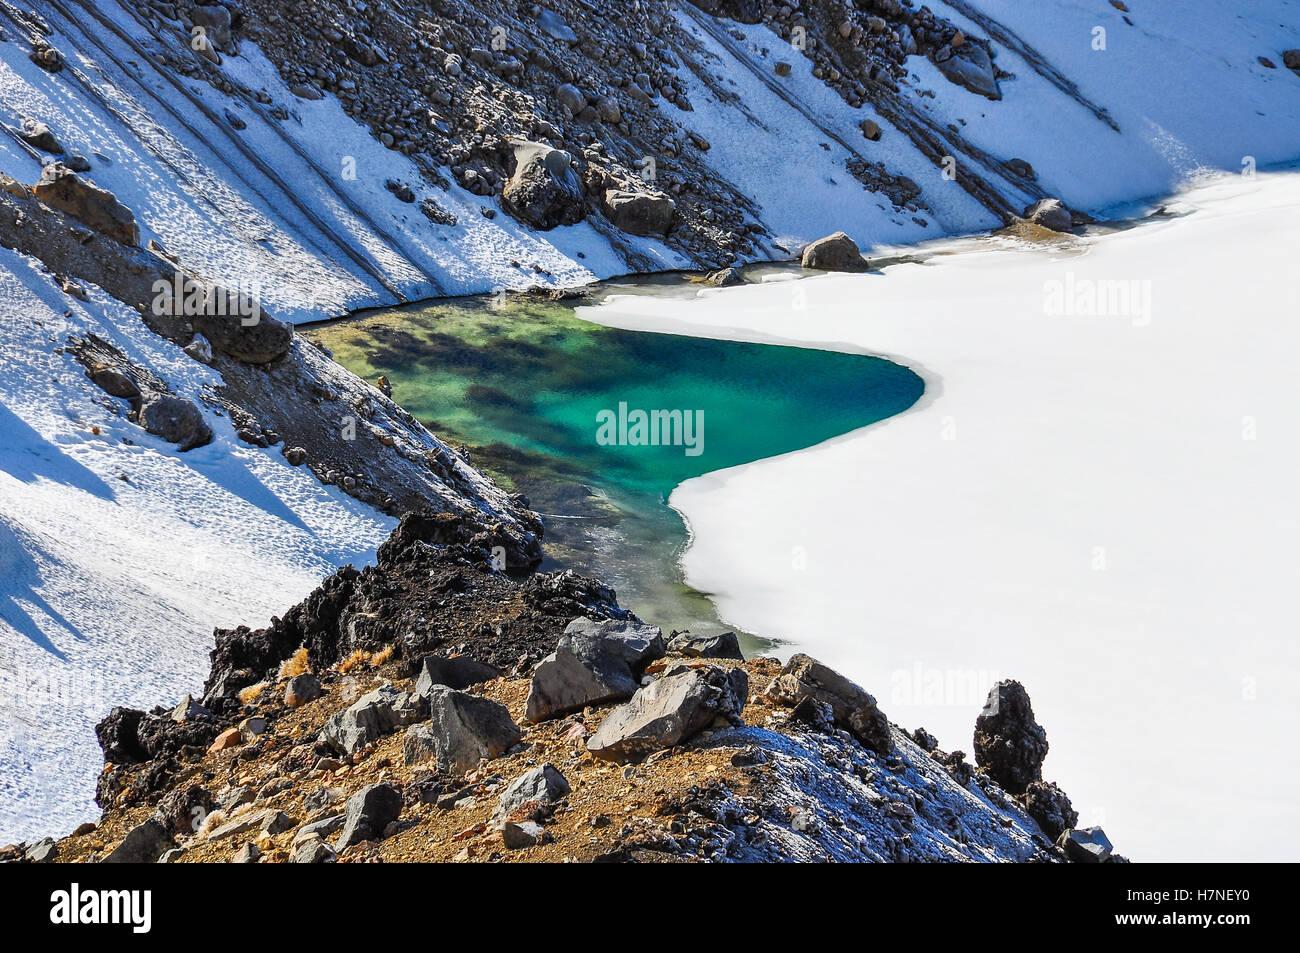 Des eaux vert émeraude à l'hiver Alpin Tongariro Crossing, New Zealand Photo Stock